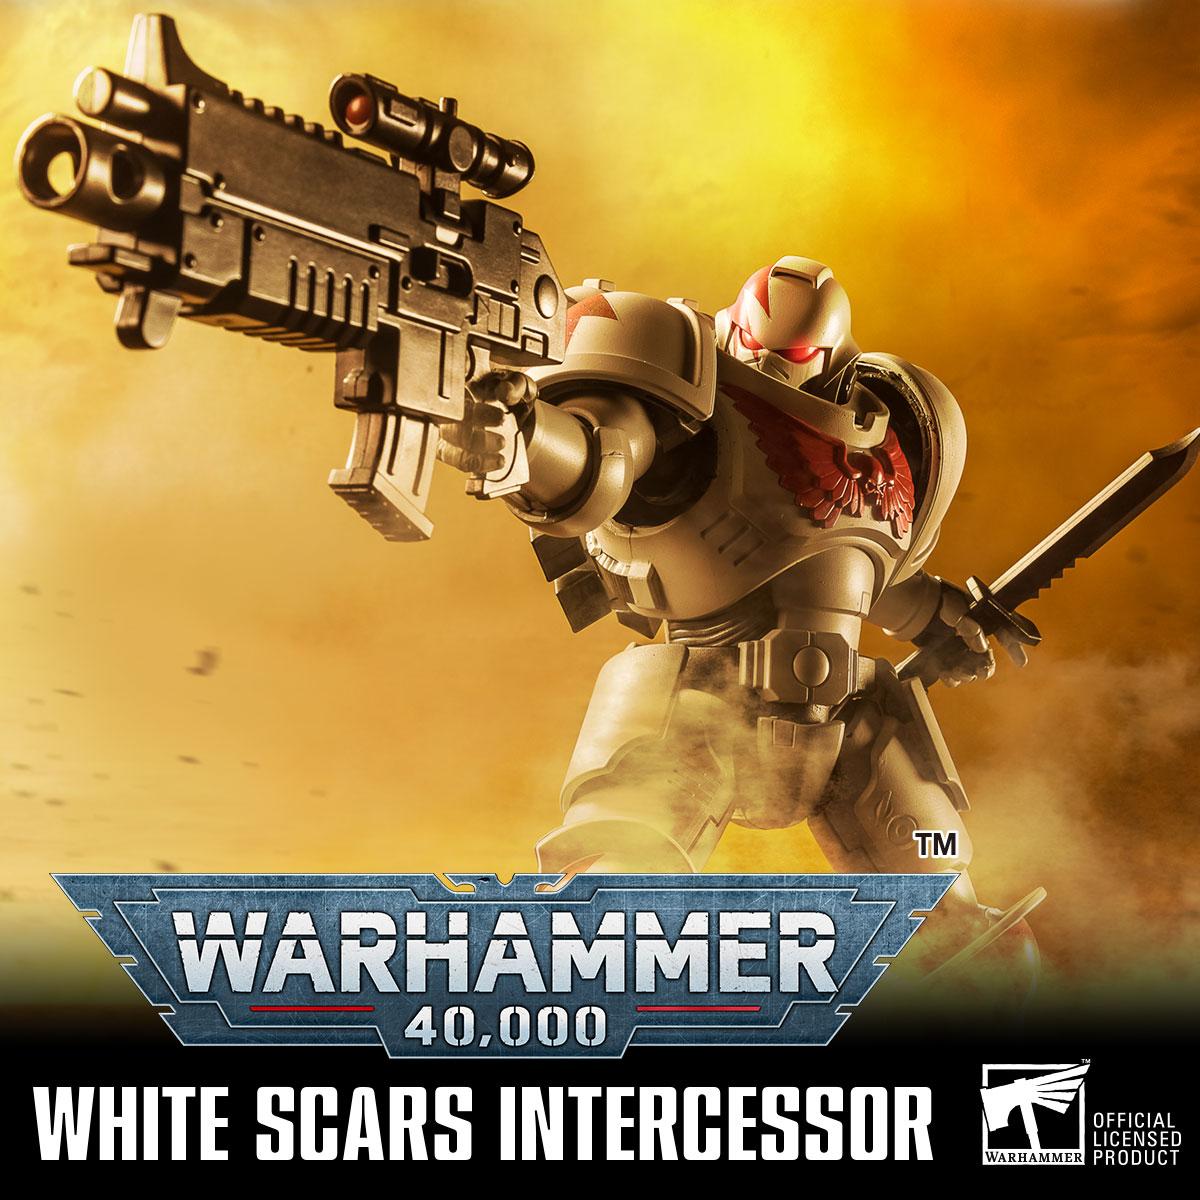 WARHAMMMER 40,000 WHITE SCARS INTERCESSOR